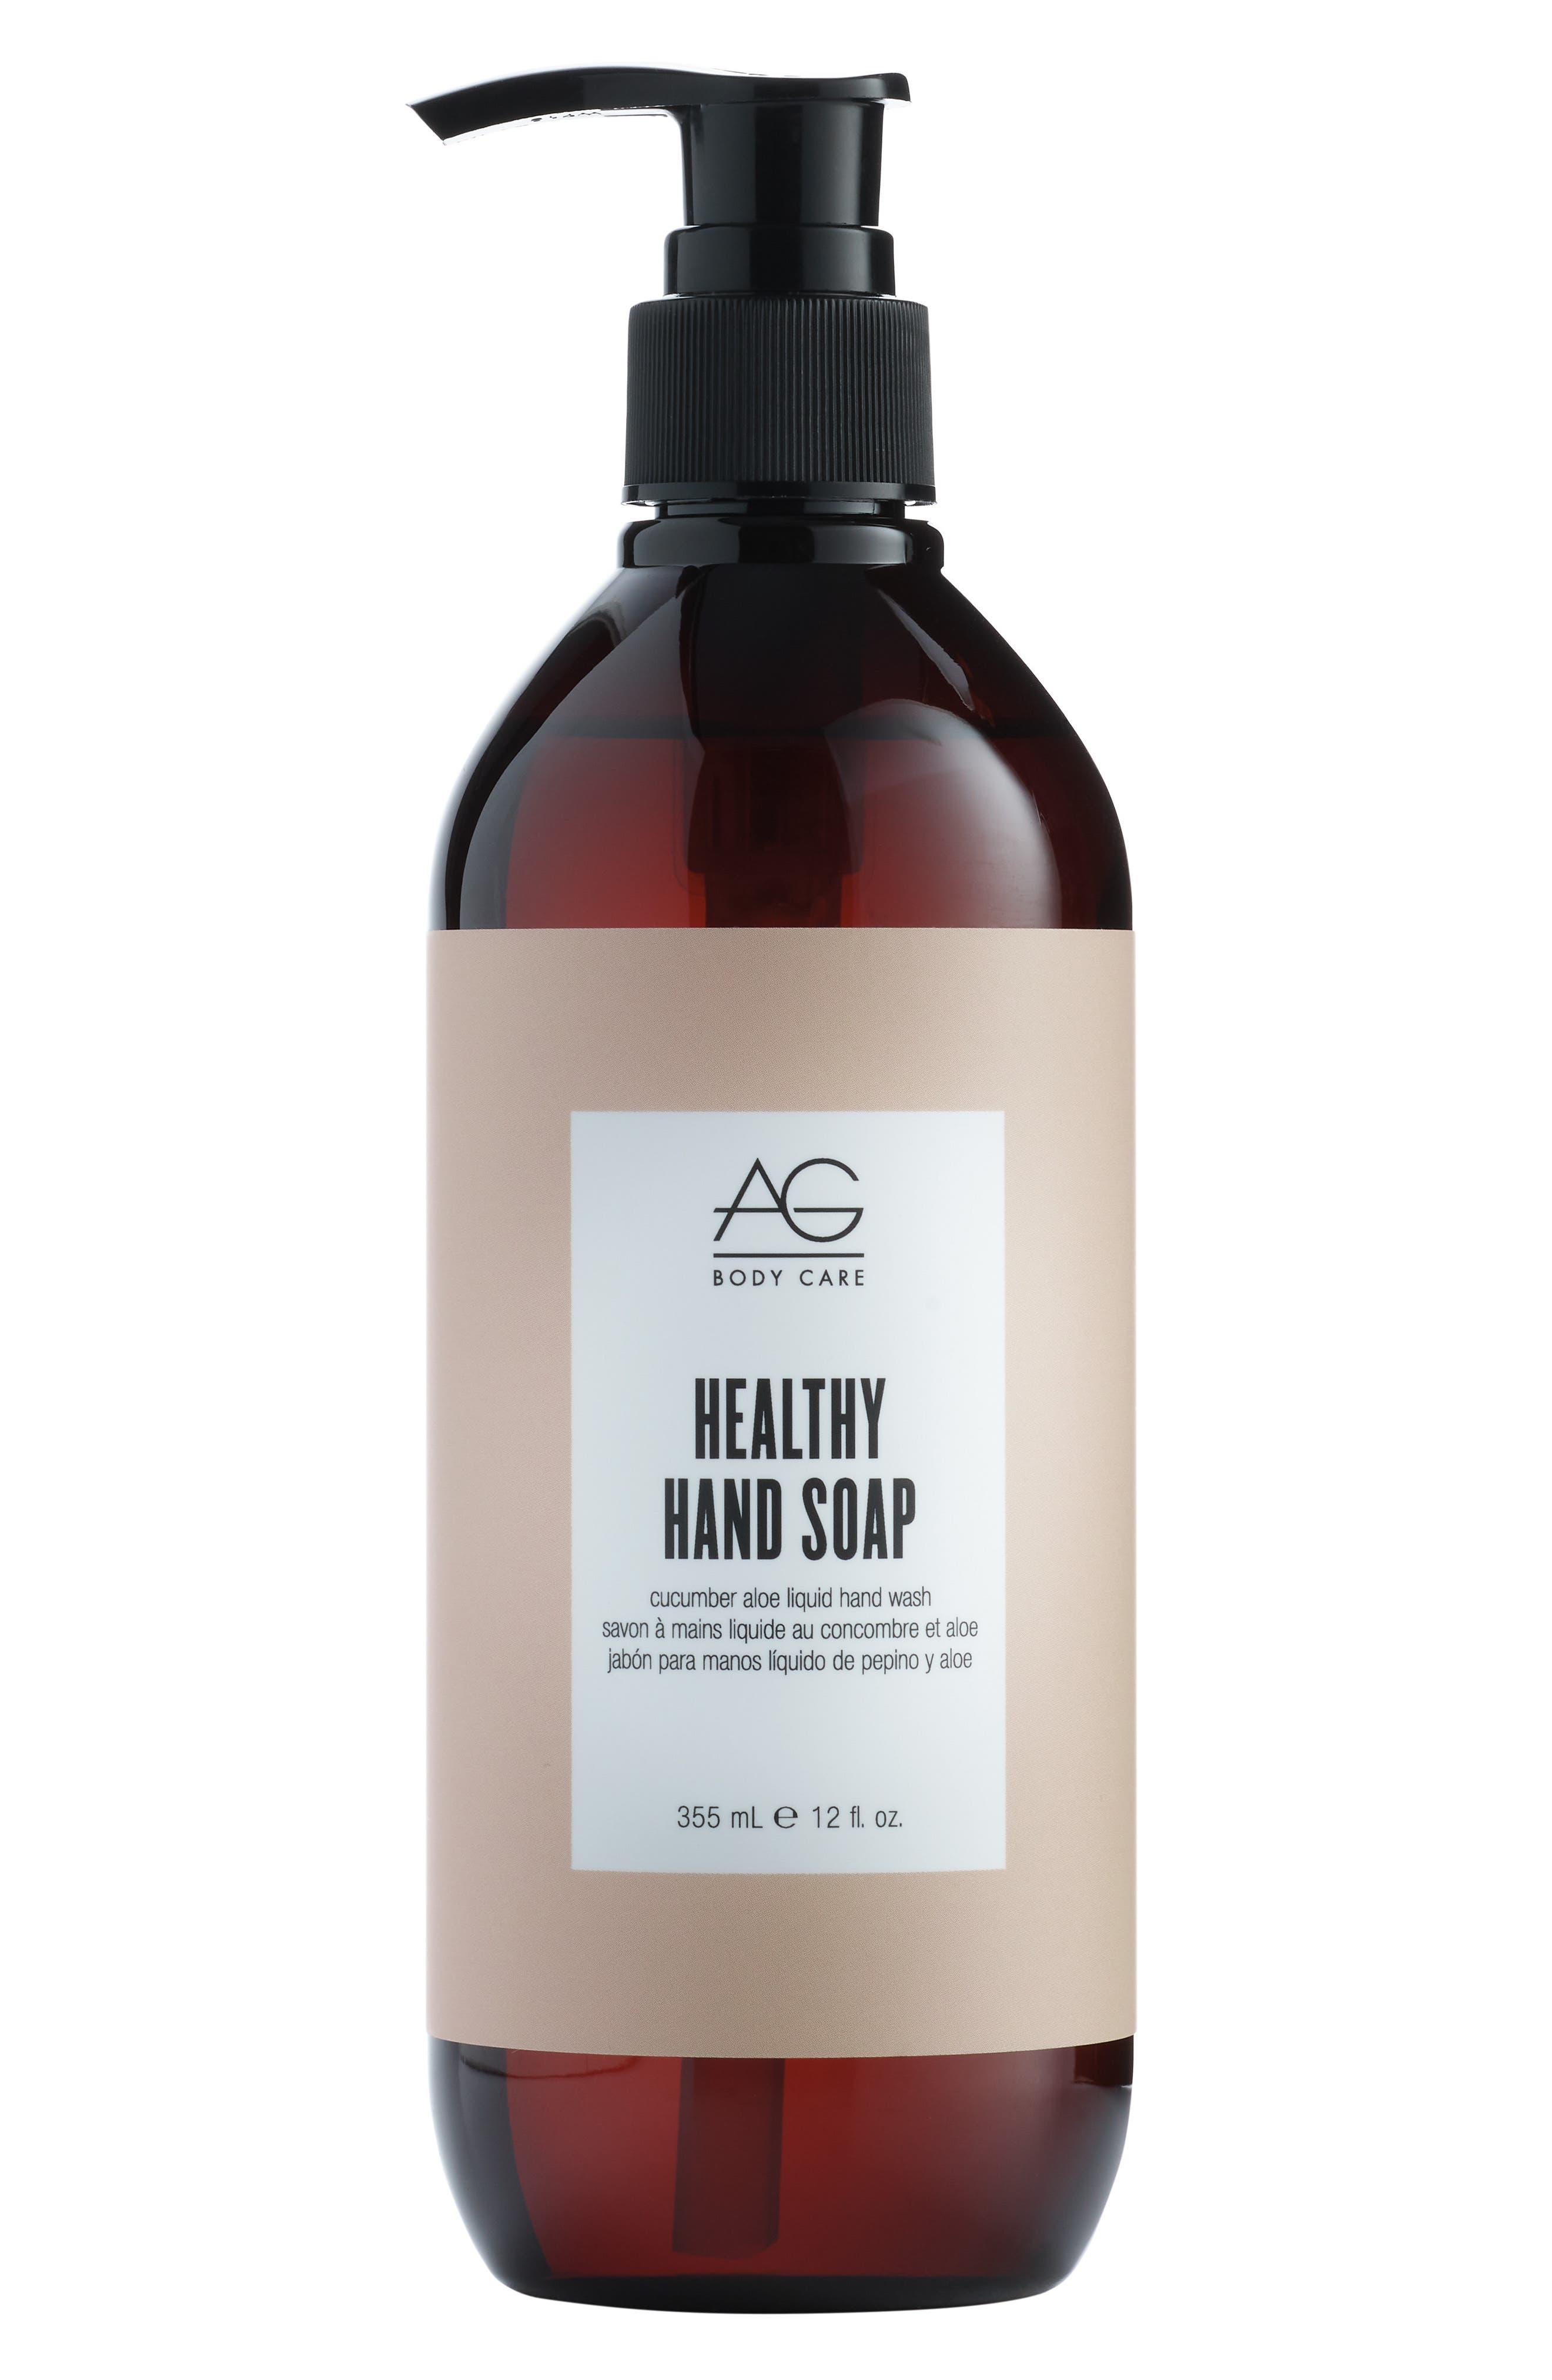 Healthy Hand Soap